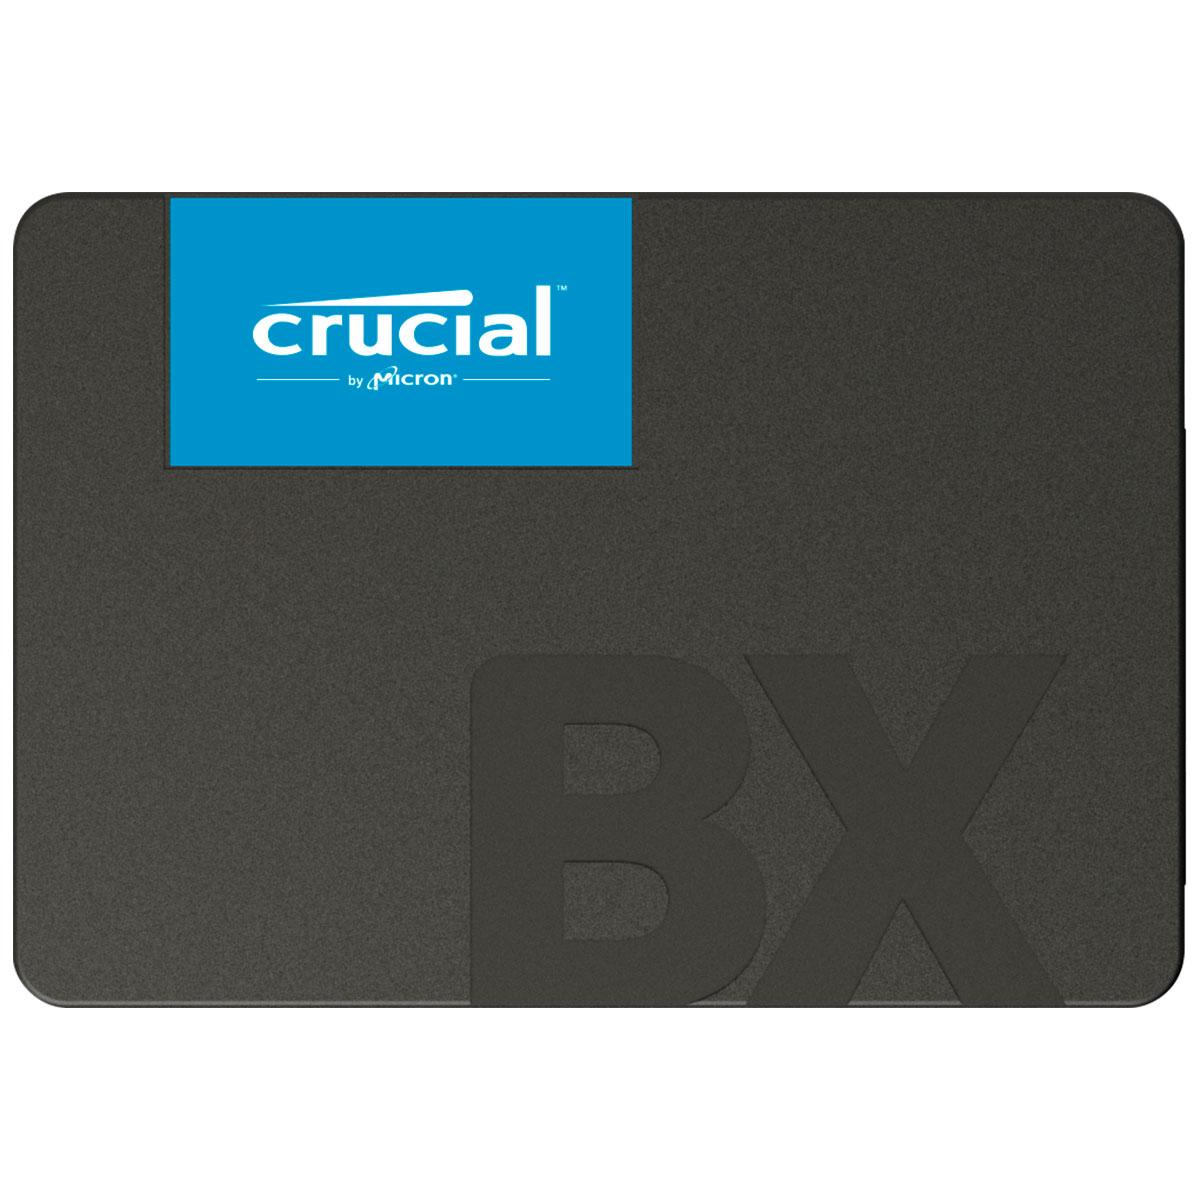 HD SSD Crucial BX500, 1TB, Leitura 540 MB/s, Escrita 500 MB/s, SATA 6 Gb/s, 2.5''